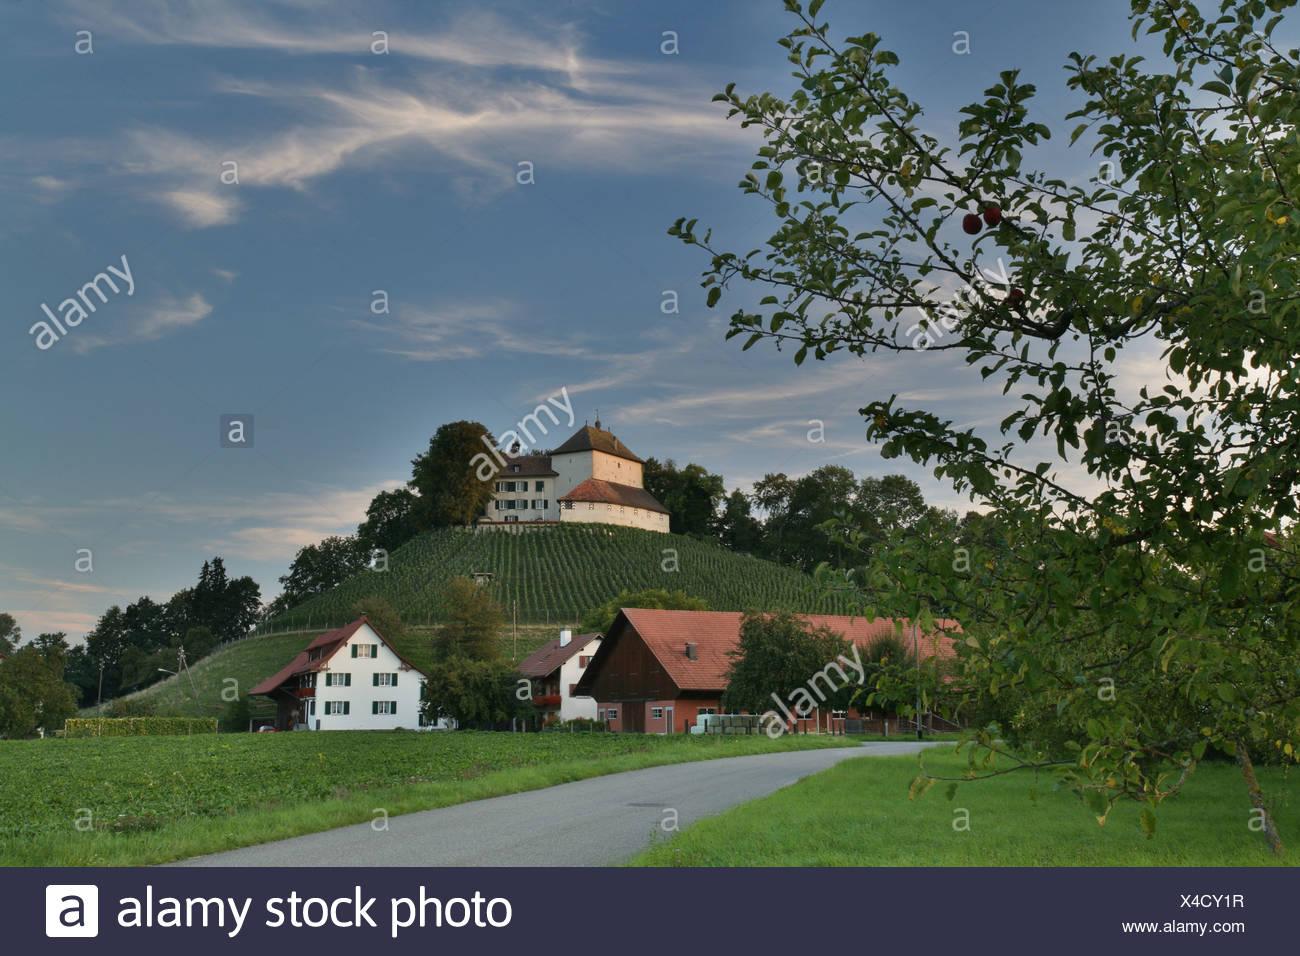 Girsberg castle on a drumlin in the Stammertal valley, Zurich, Switzerland - Stock Image